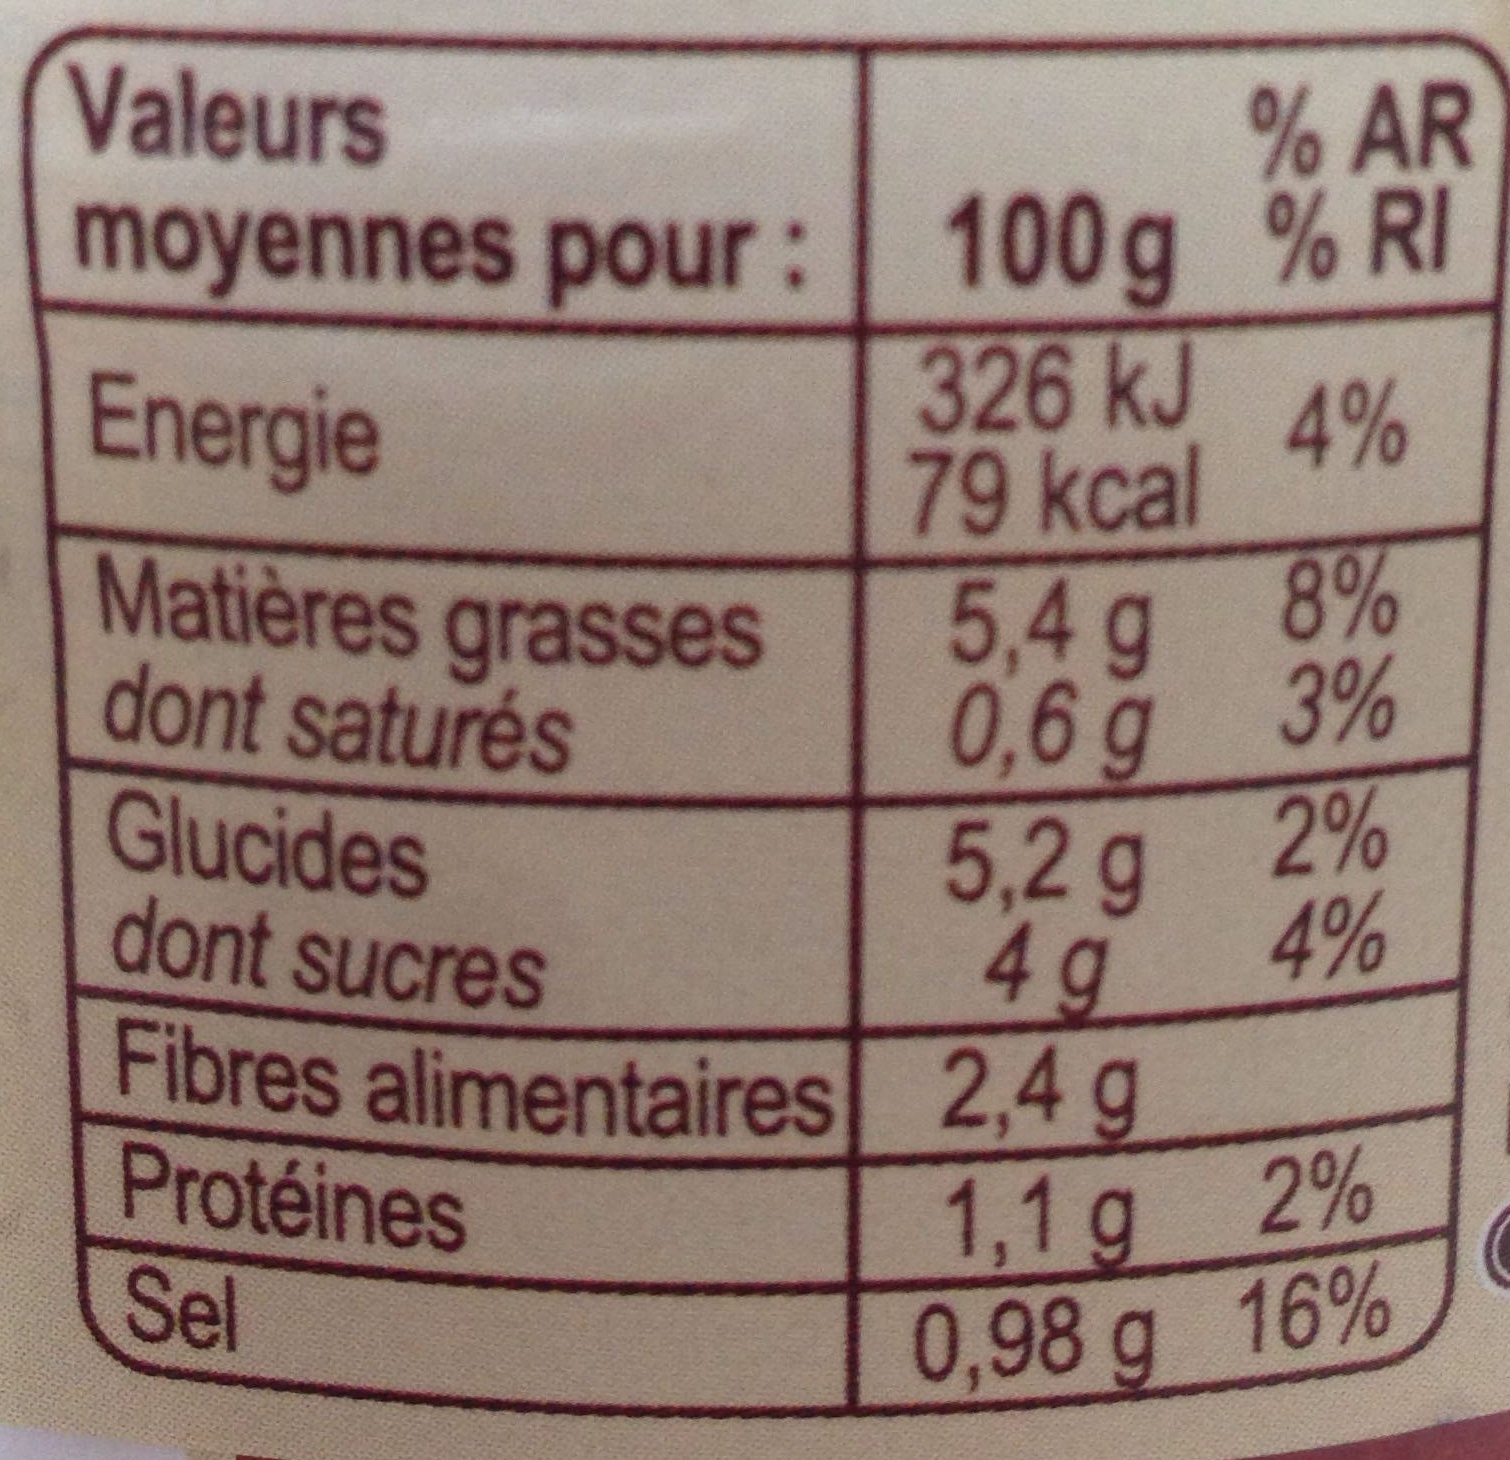 Aubergines à la Provençale - Voedingswaarden - fr